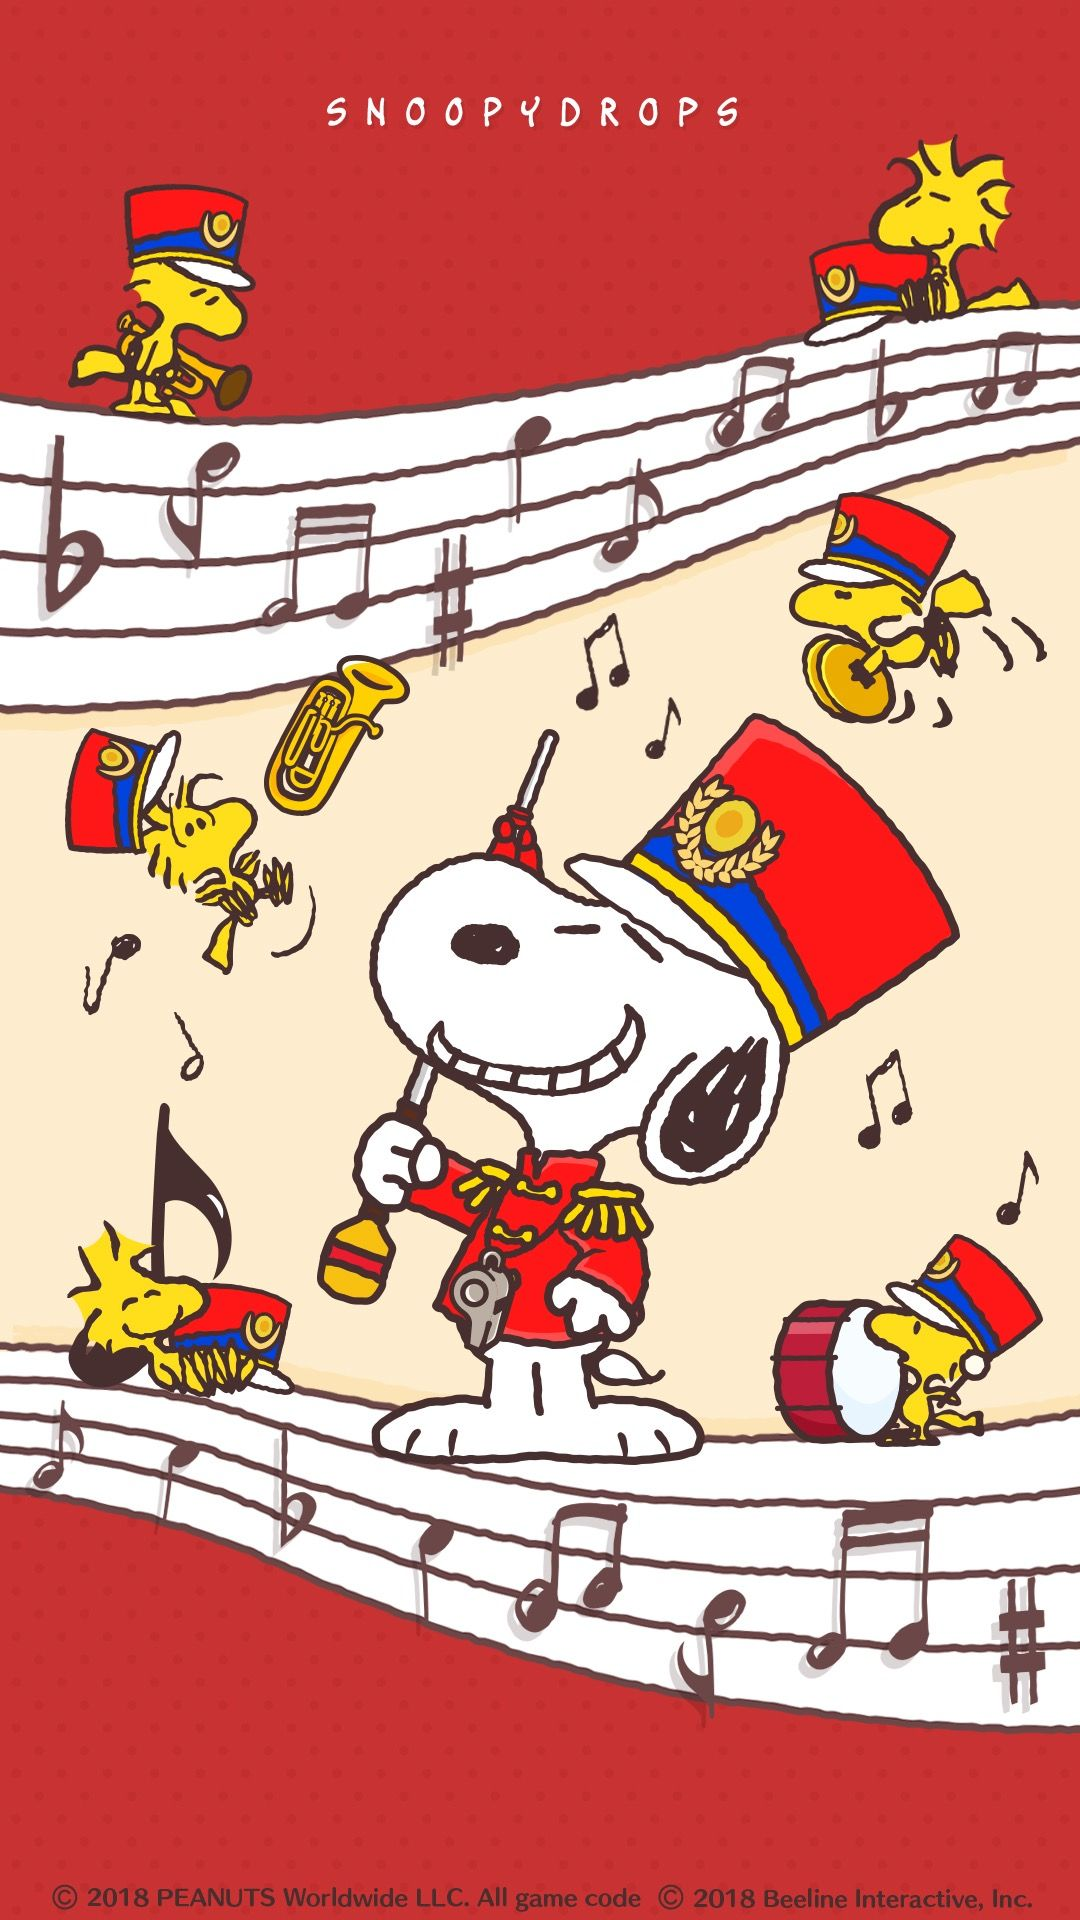 Snoopy スヌーピー マーチングバンド スヌーピーの壁紙